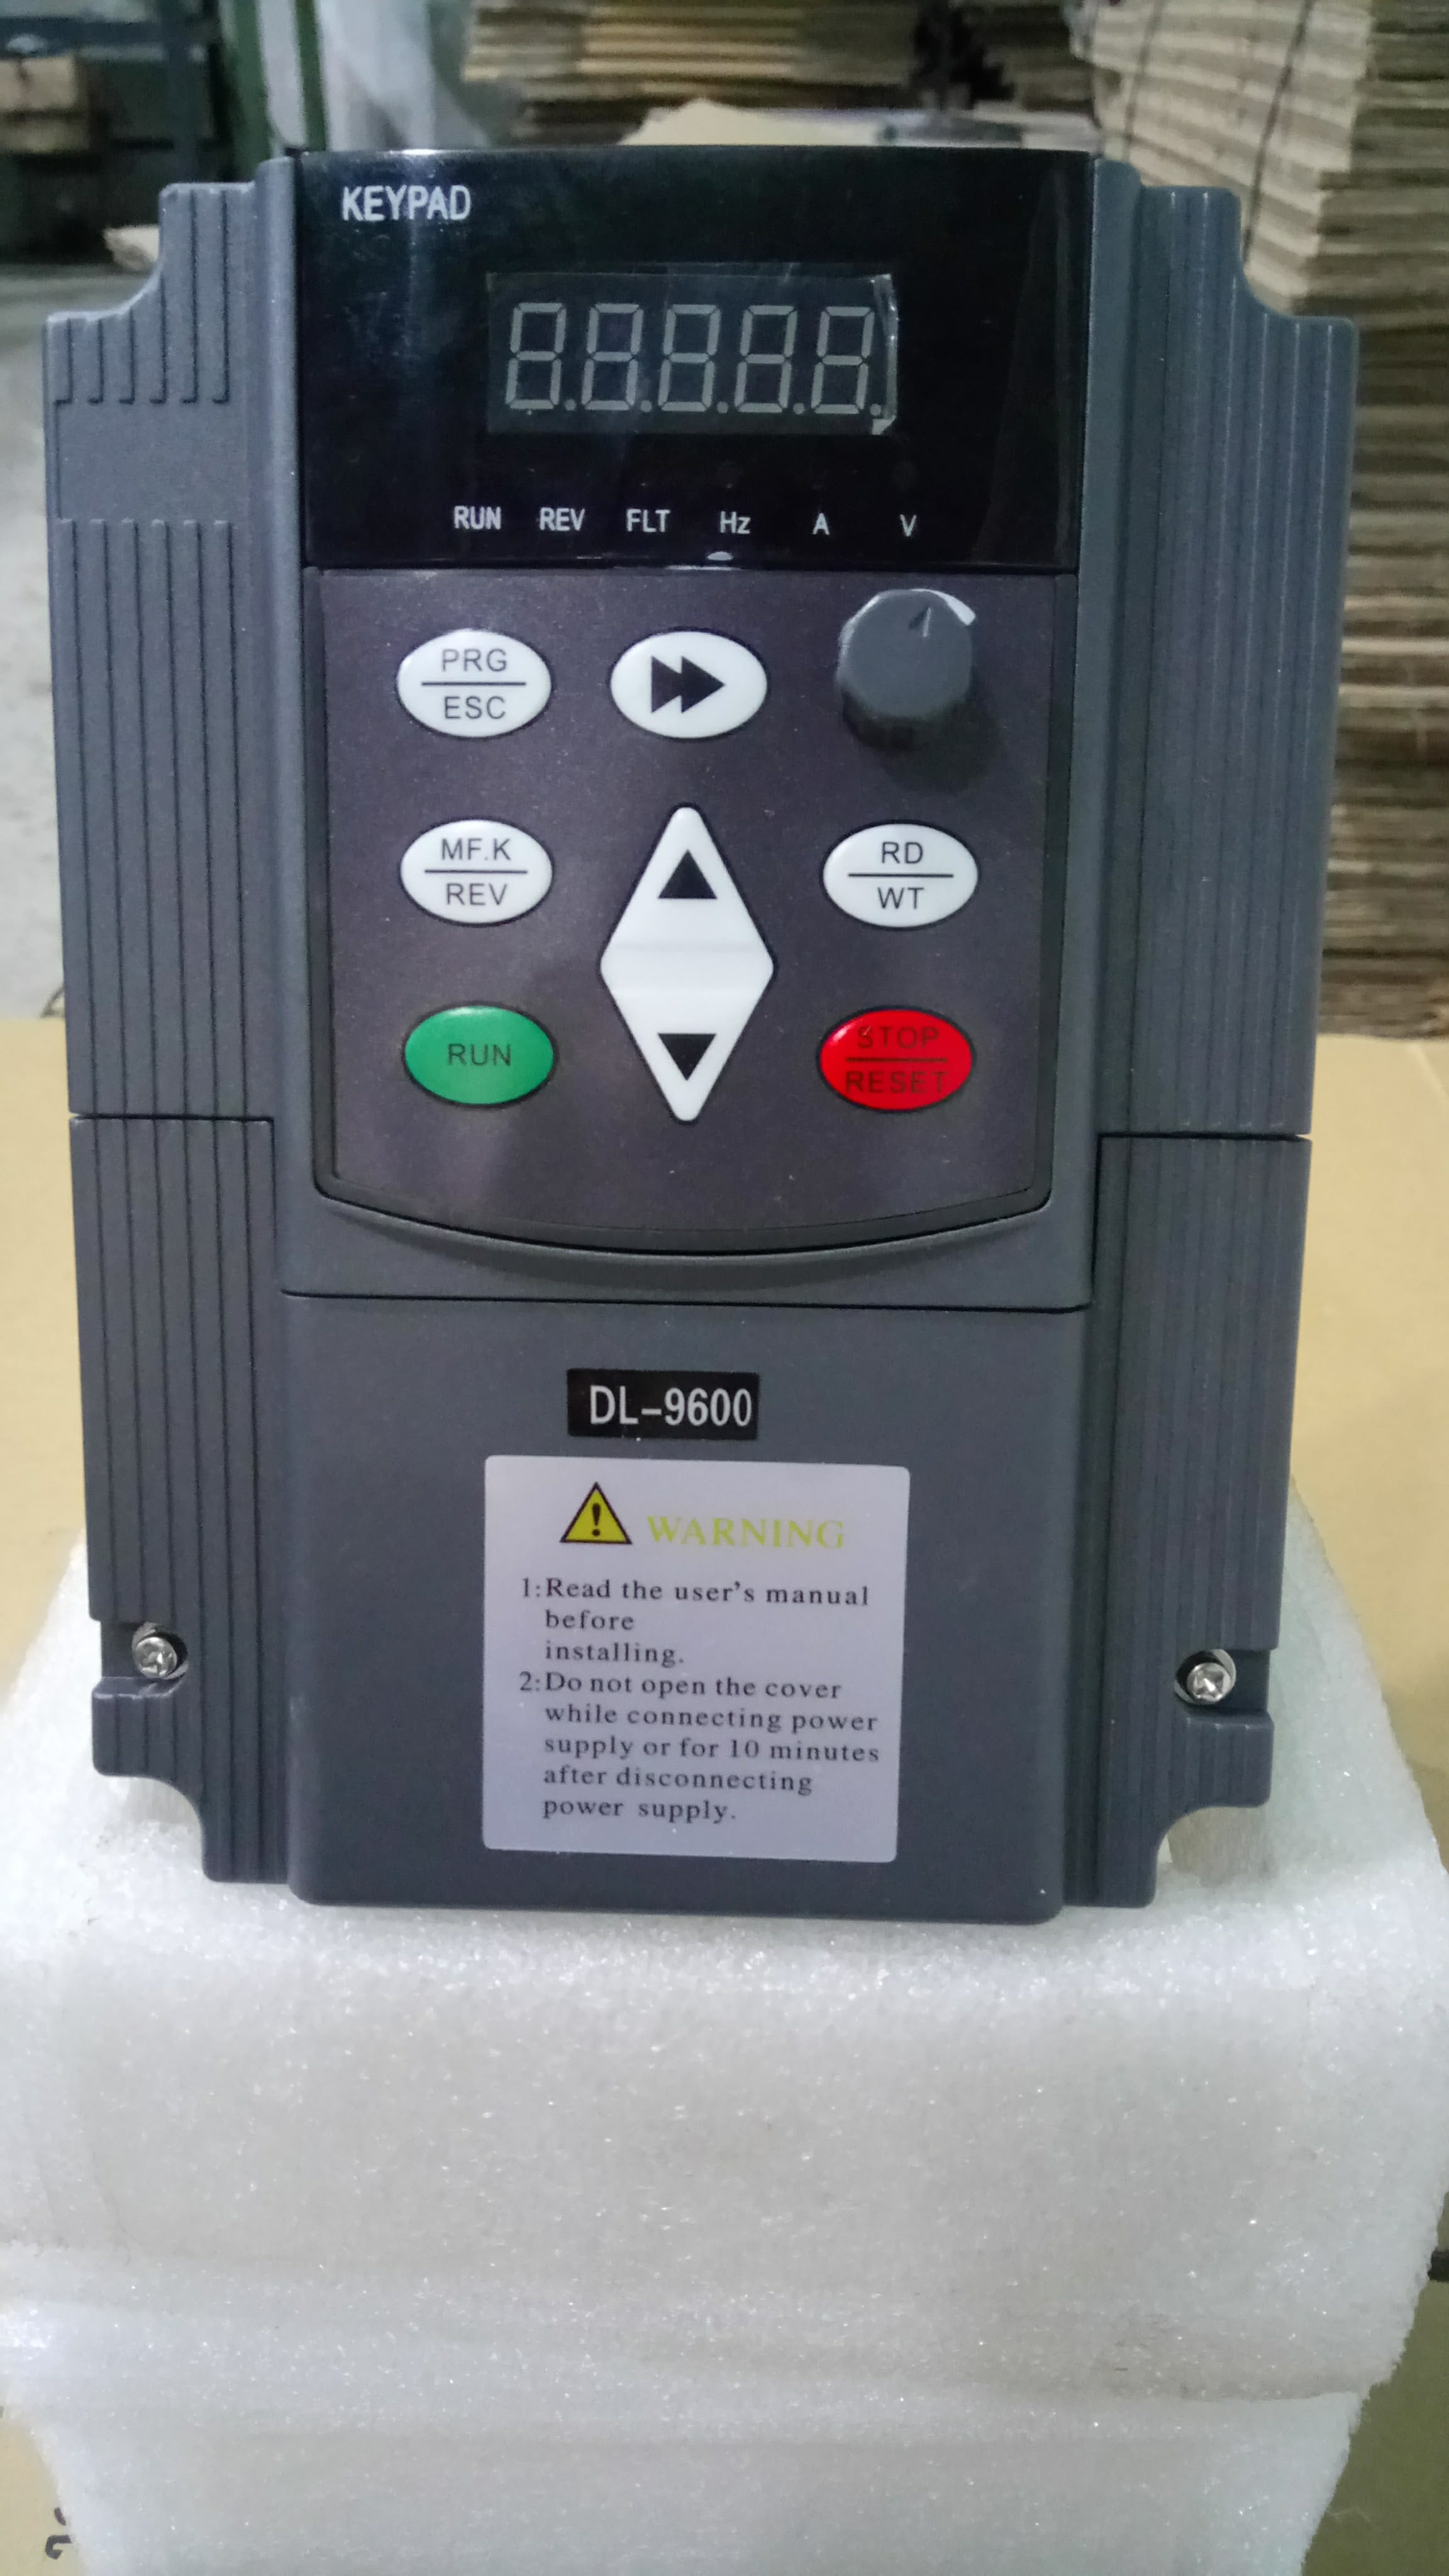 biến tần inverter dolin 380v